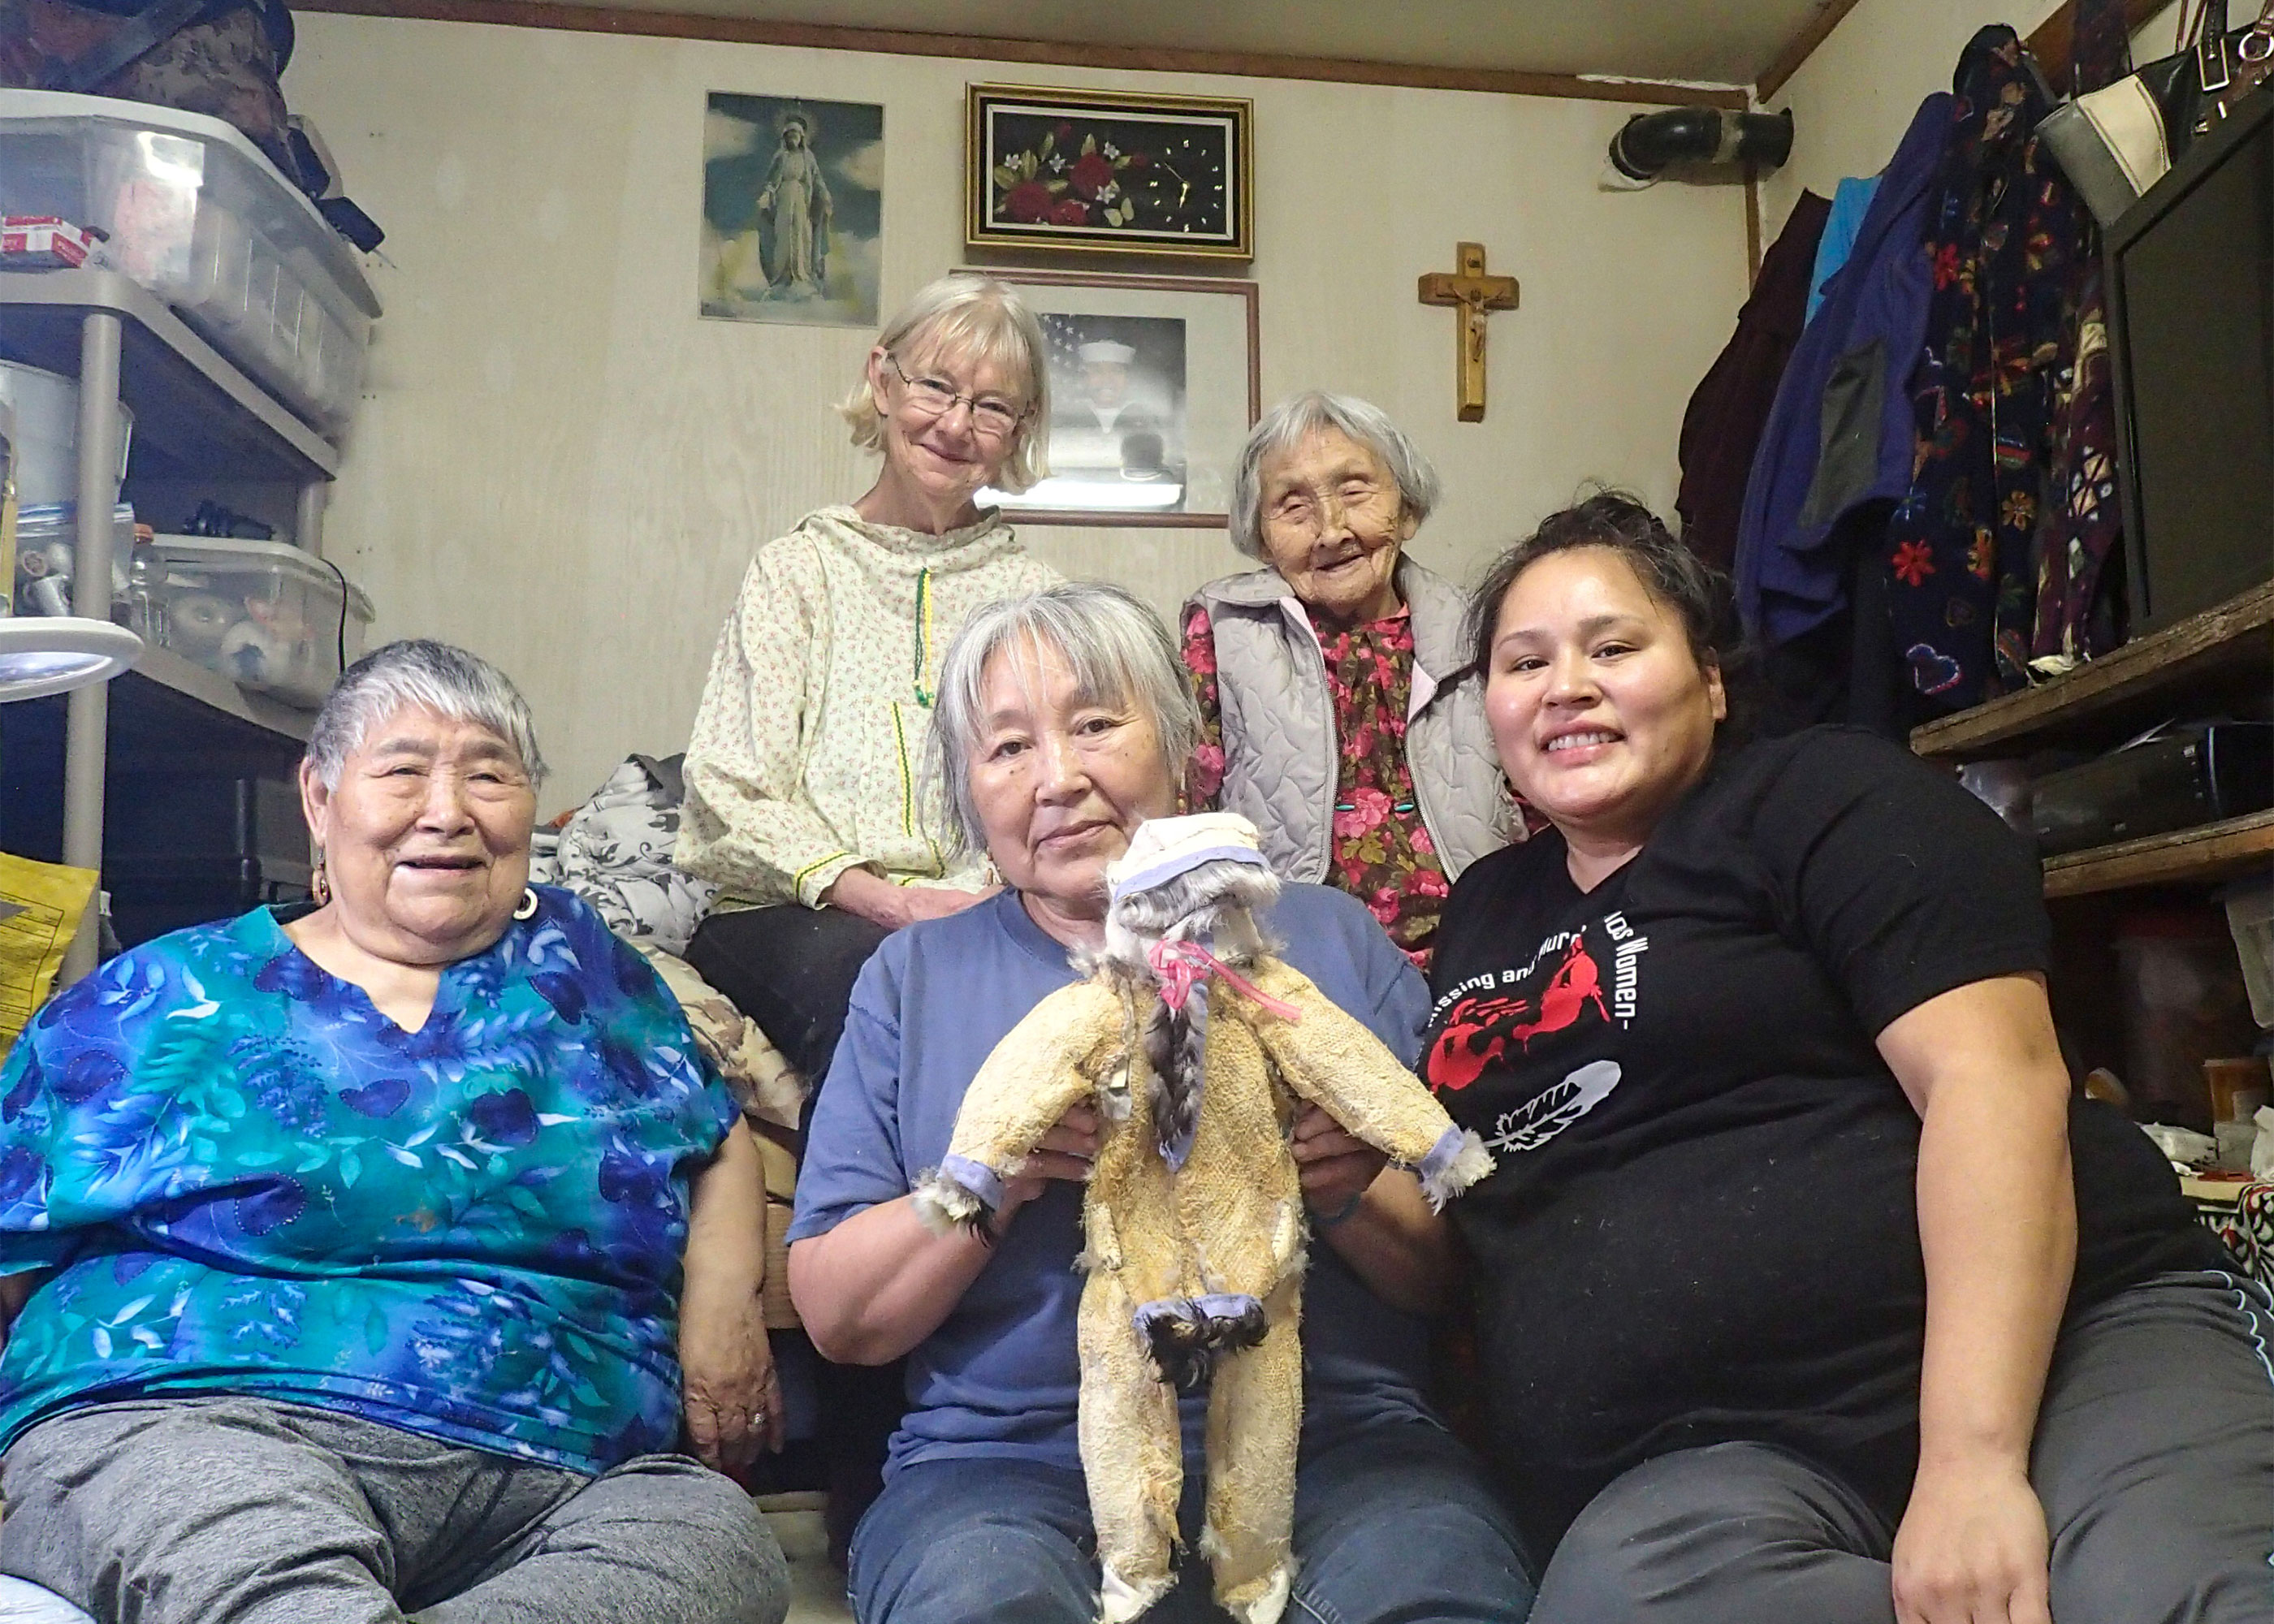 Clockwise from top left: Ann Fienup-Riordan, Albertina Dull, Nellie Jimmie, Ruth Jimmie, and Martina John. Ann Fienup-Riordan